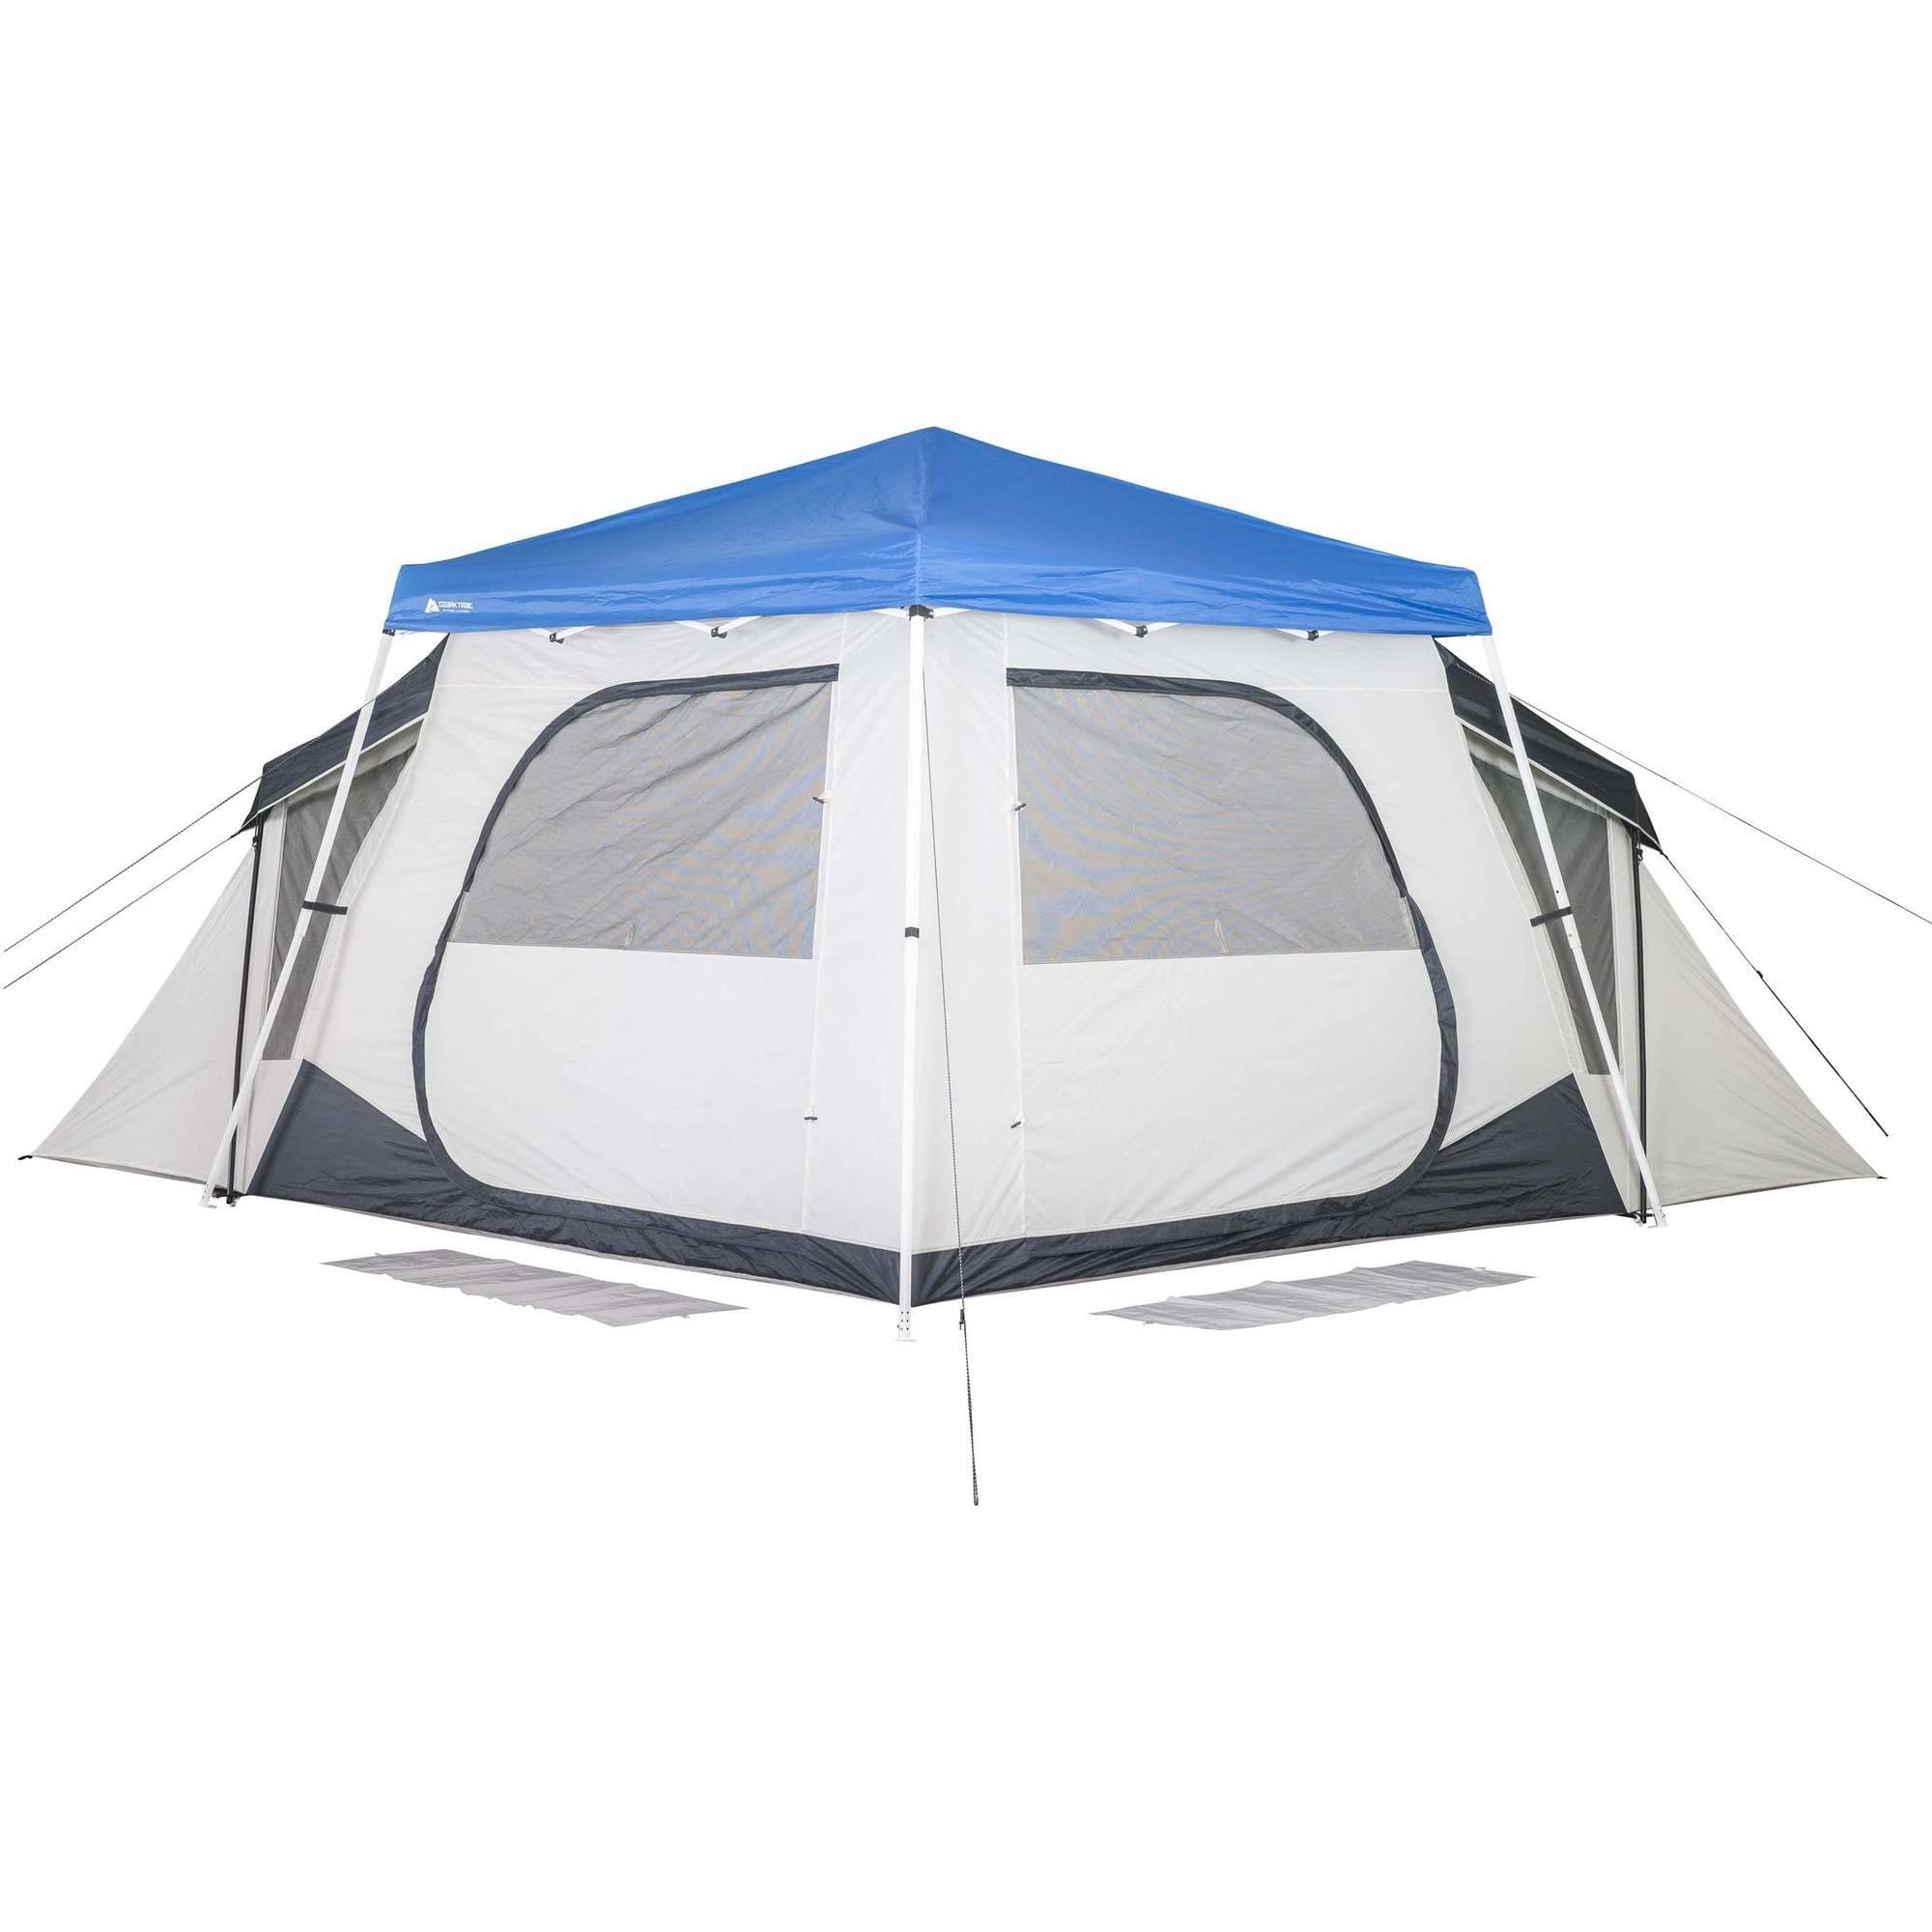 Ozark Trail 14 Person ConnecTent Canopy Tent